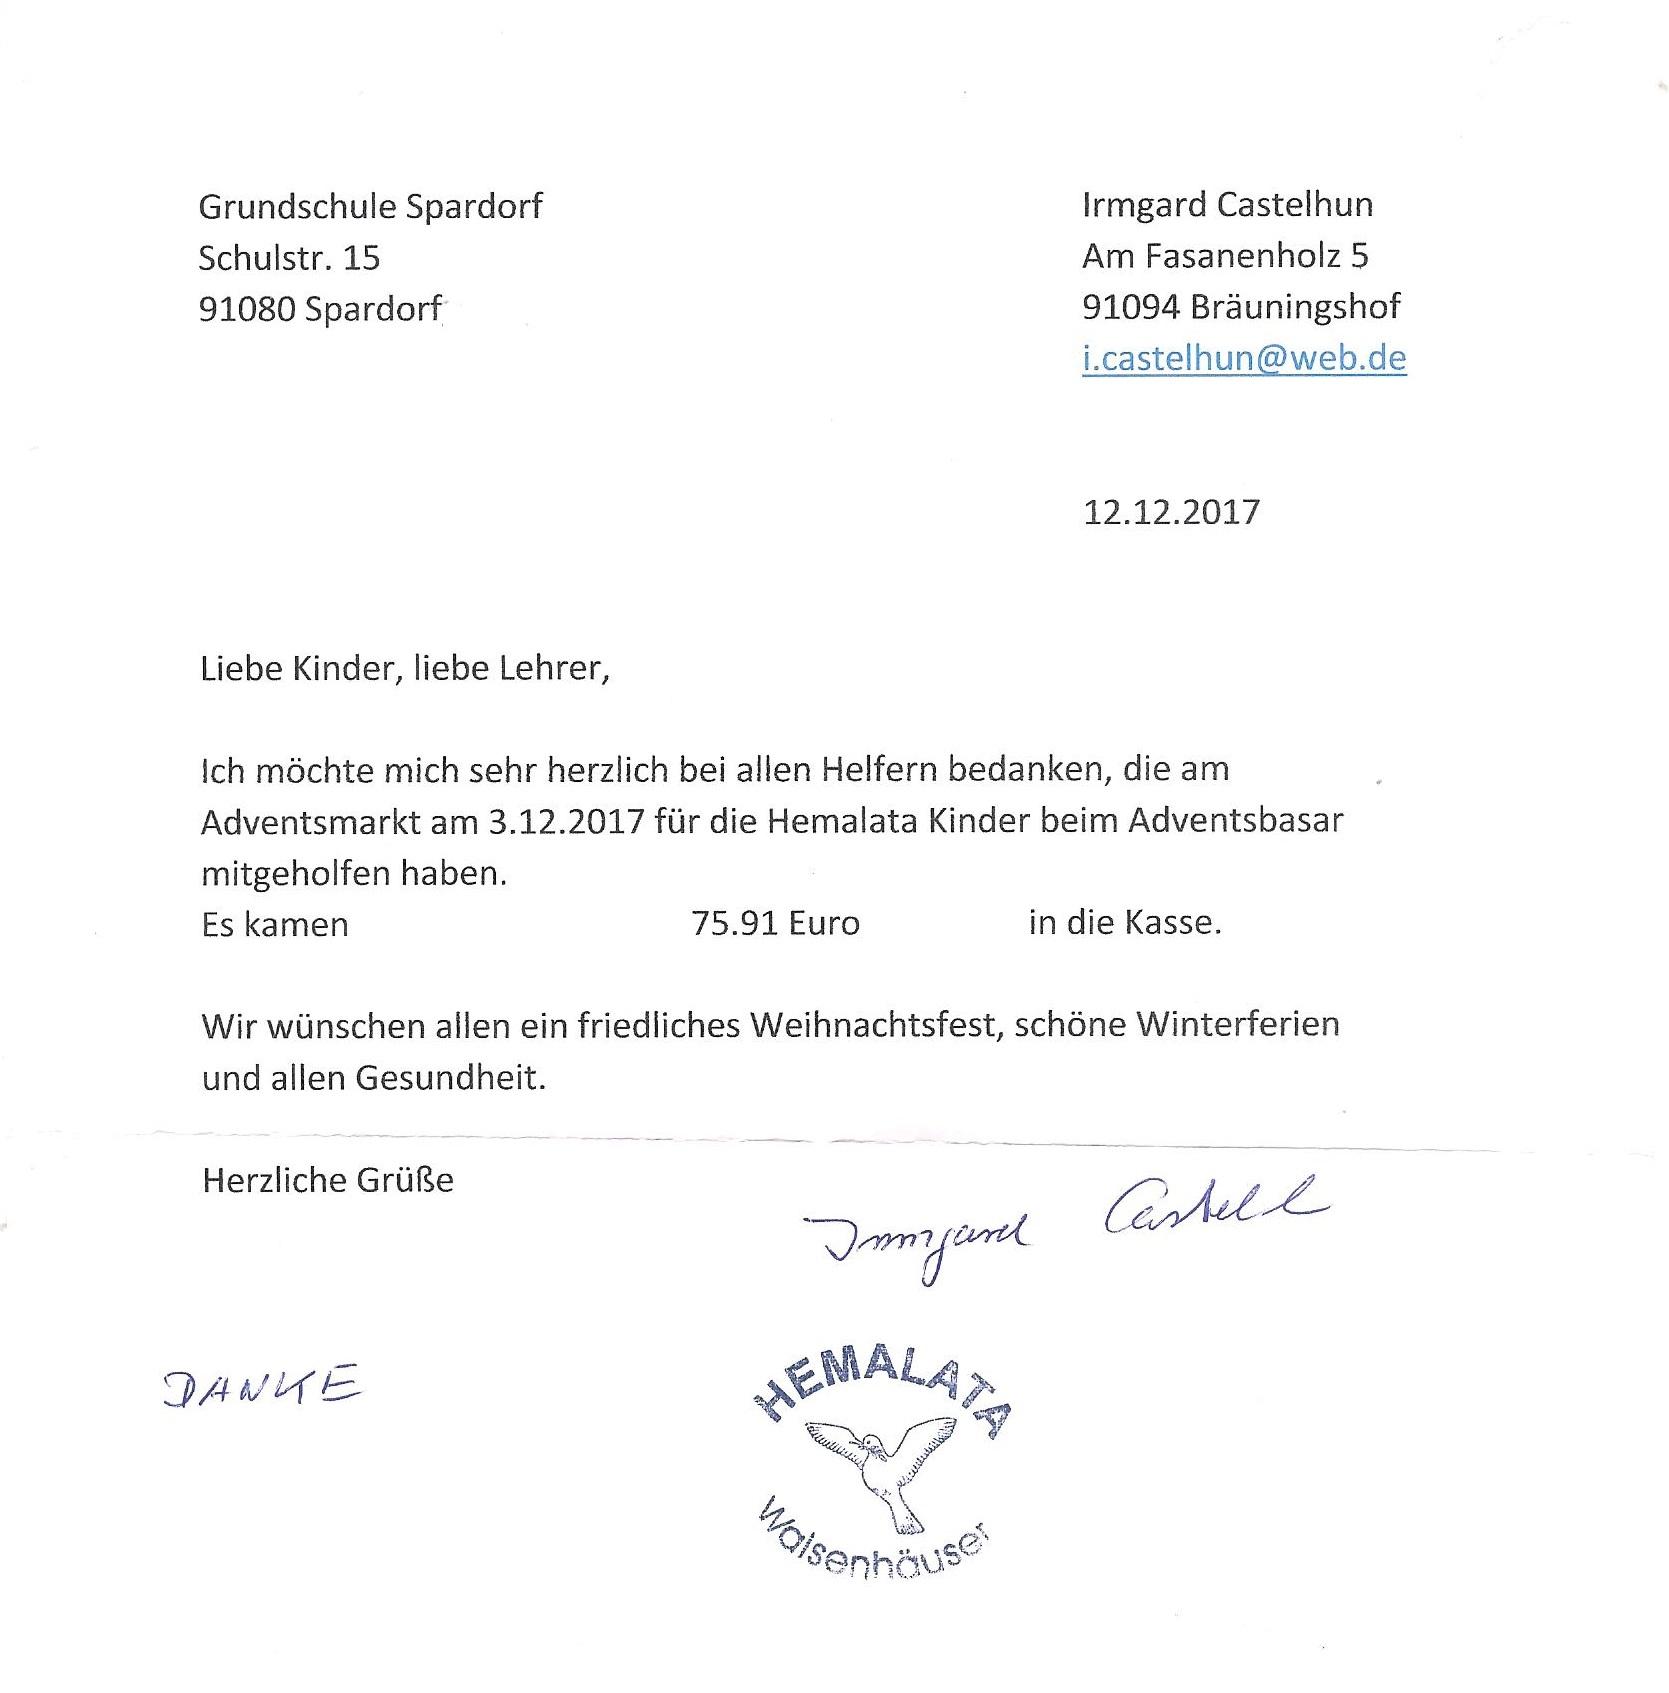 Schule Grundschule Spardorf